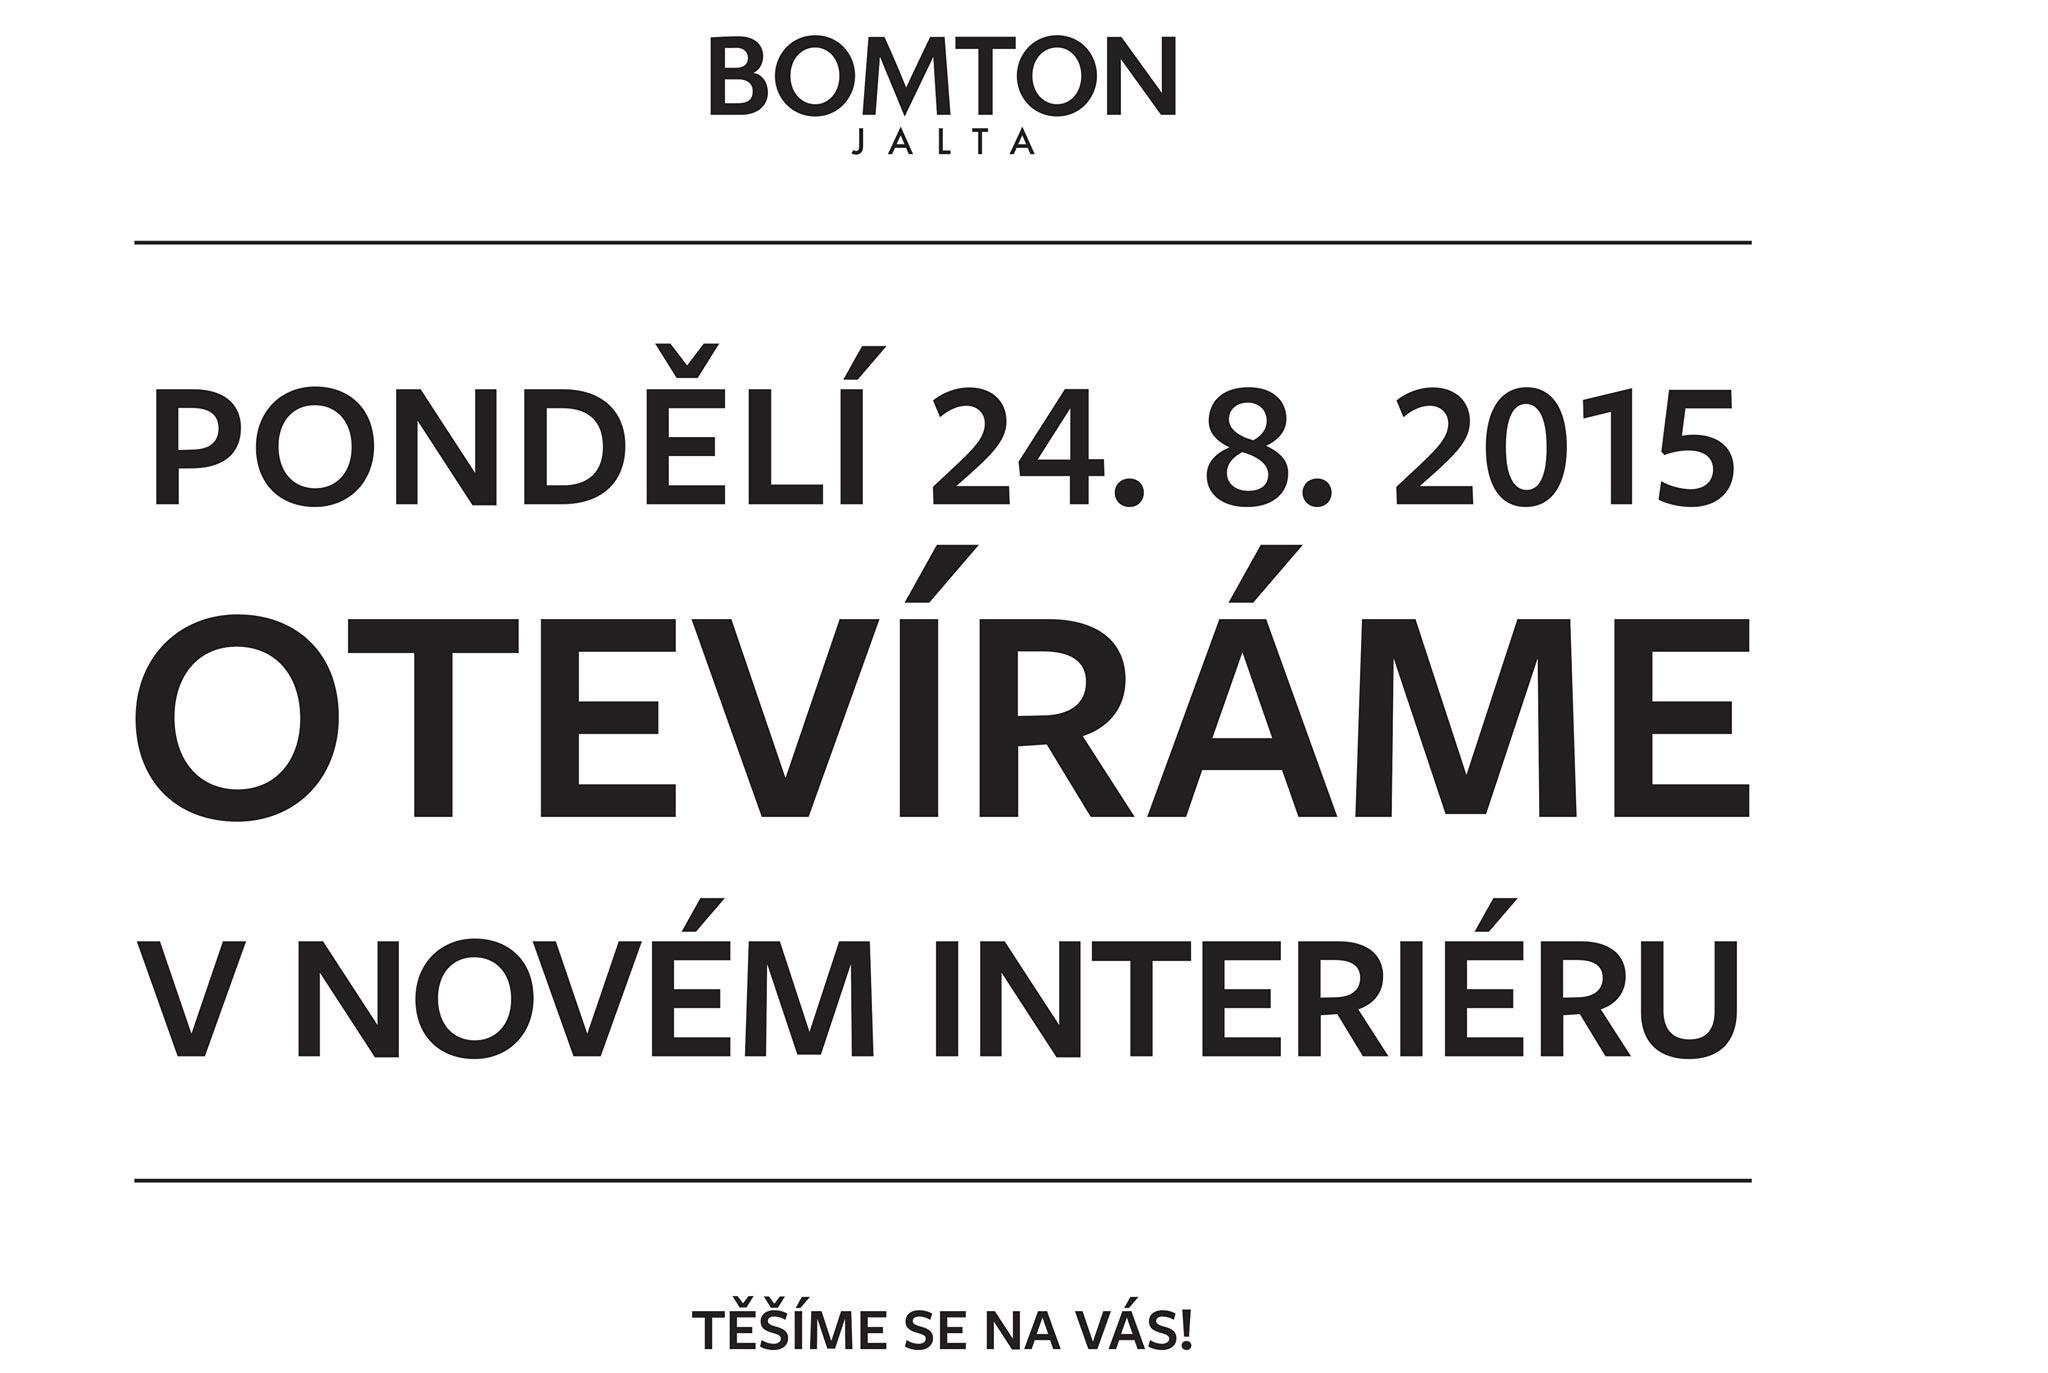 Bomton Jalta otevřel s novým interiérem.